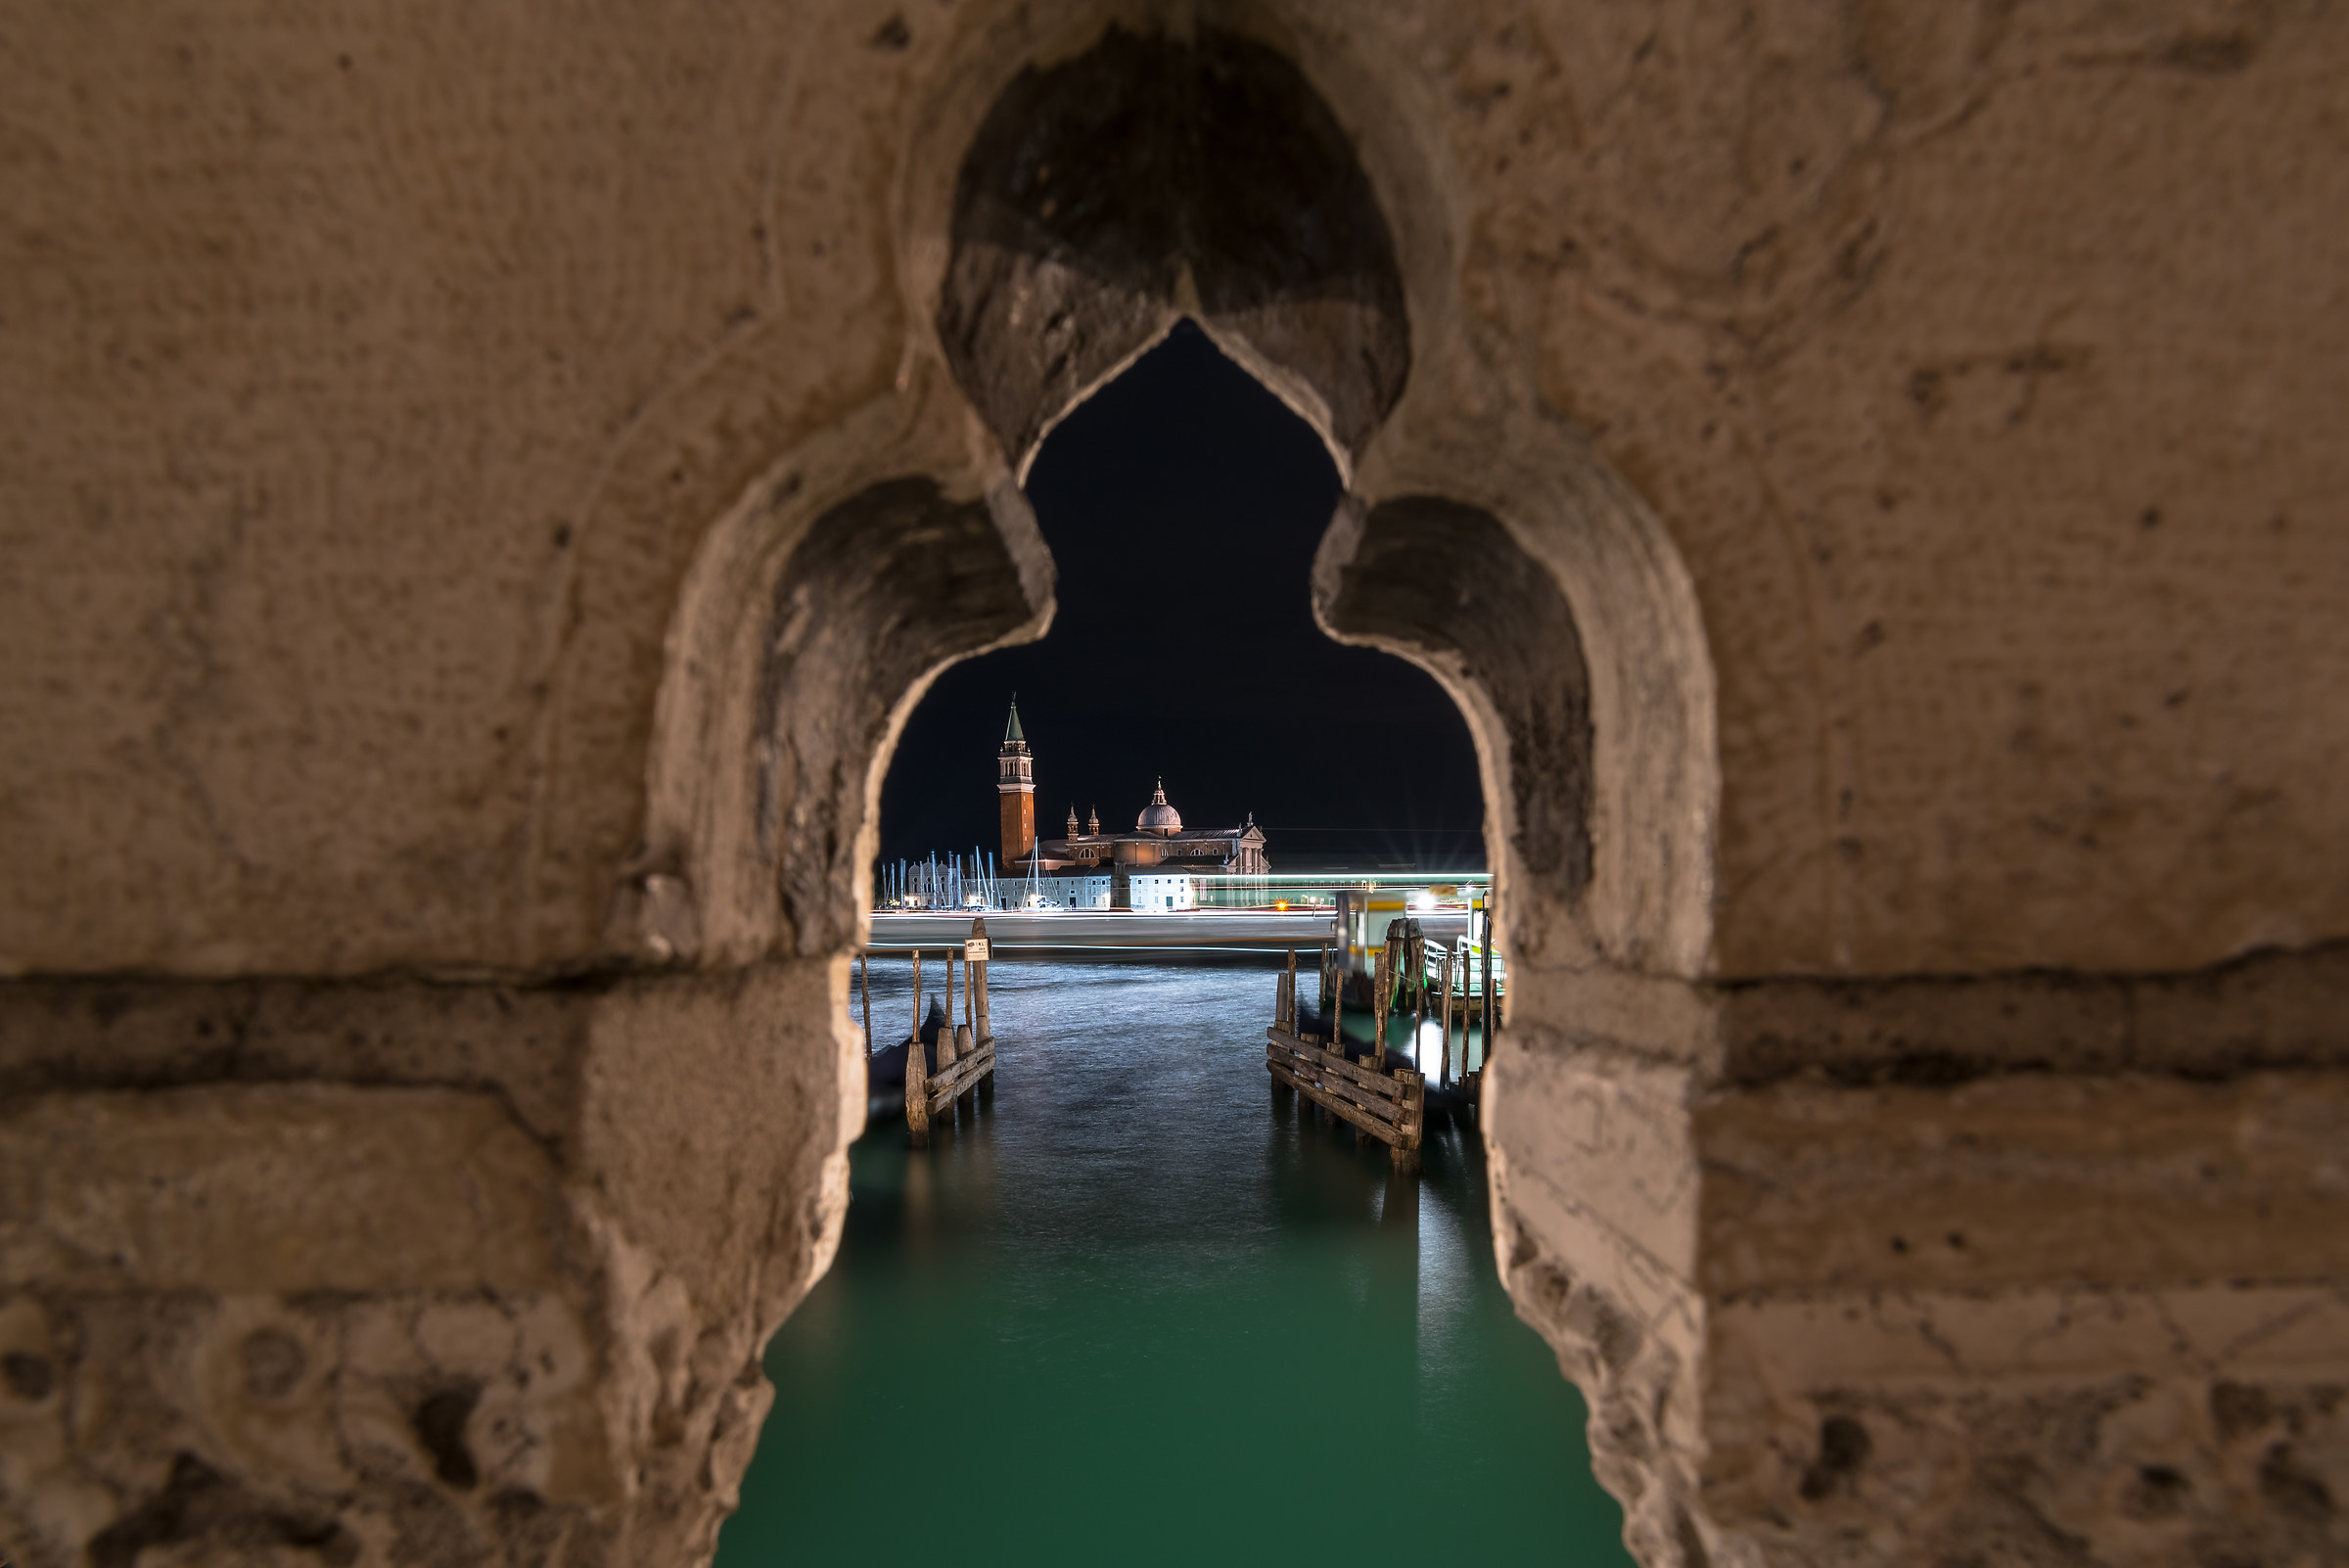 Lunghe esposizioni tra i ponti...